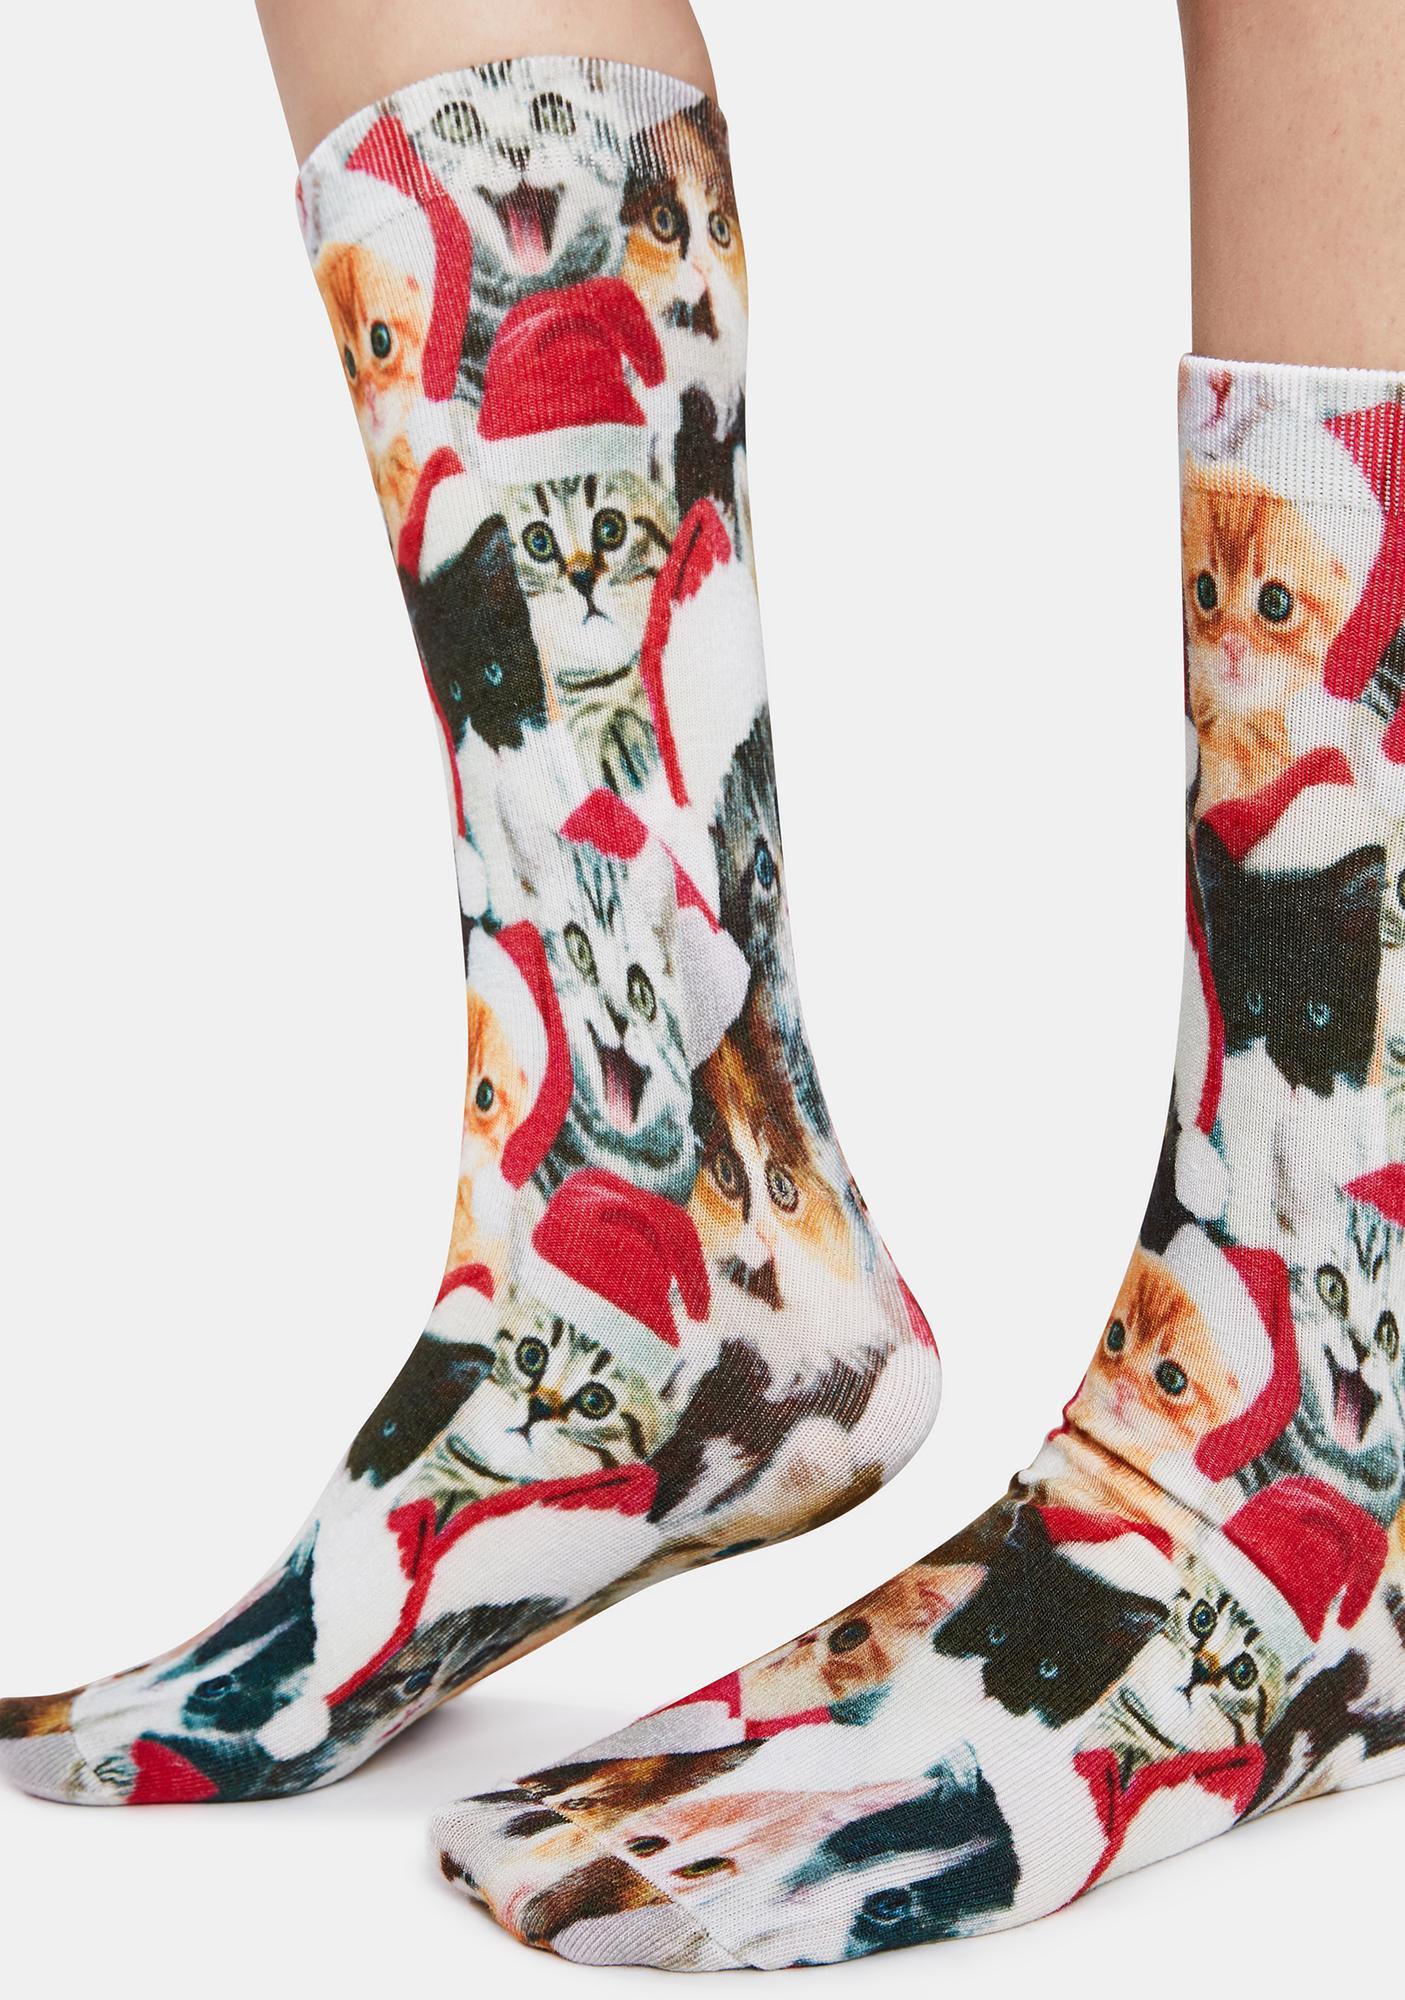 Tipsy Elves Meowy Catmus Graphic Crew Socks